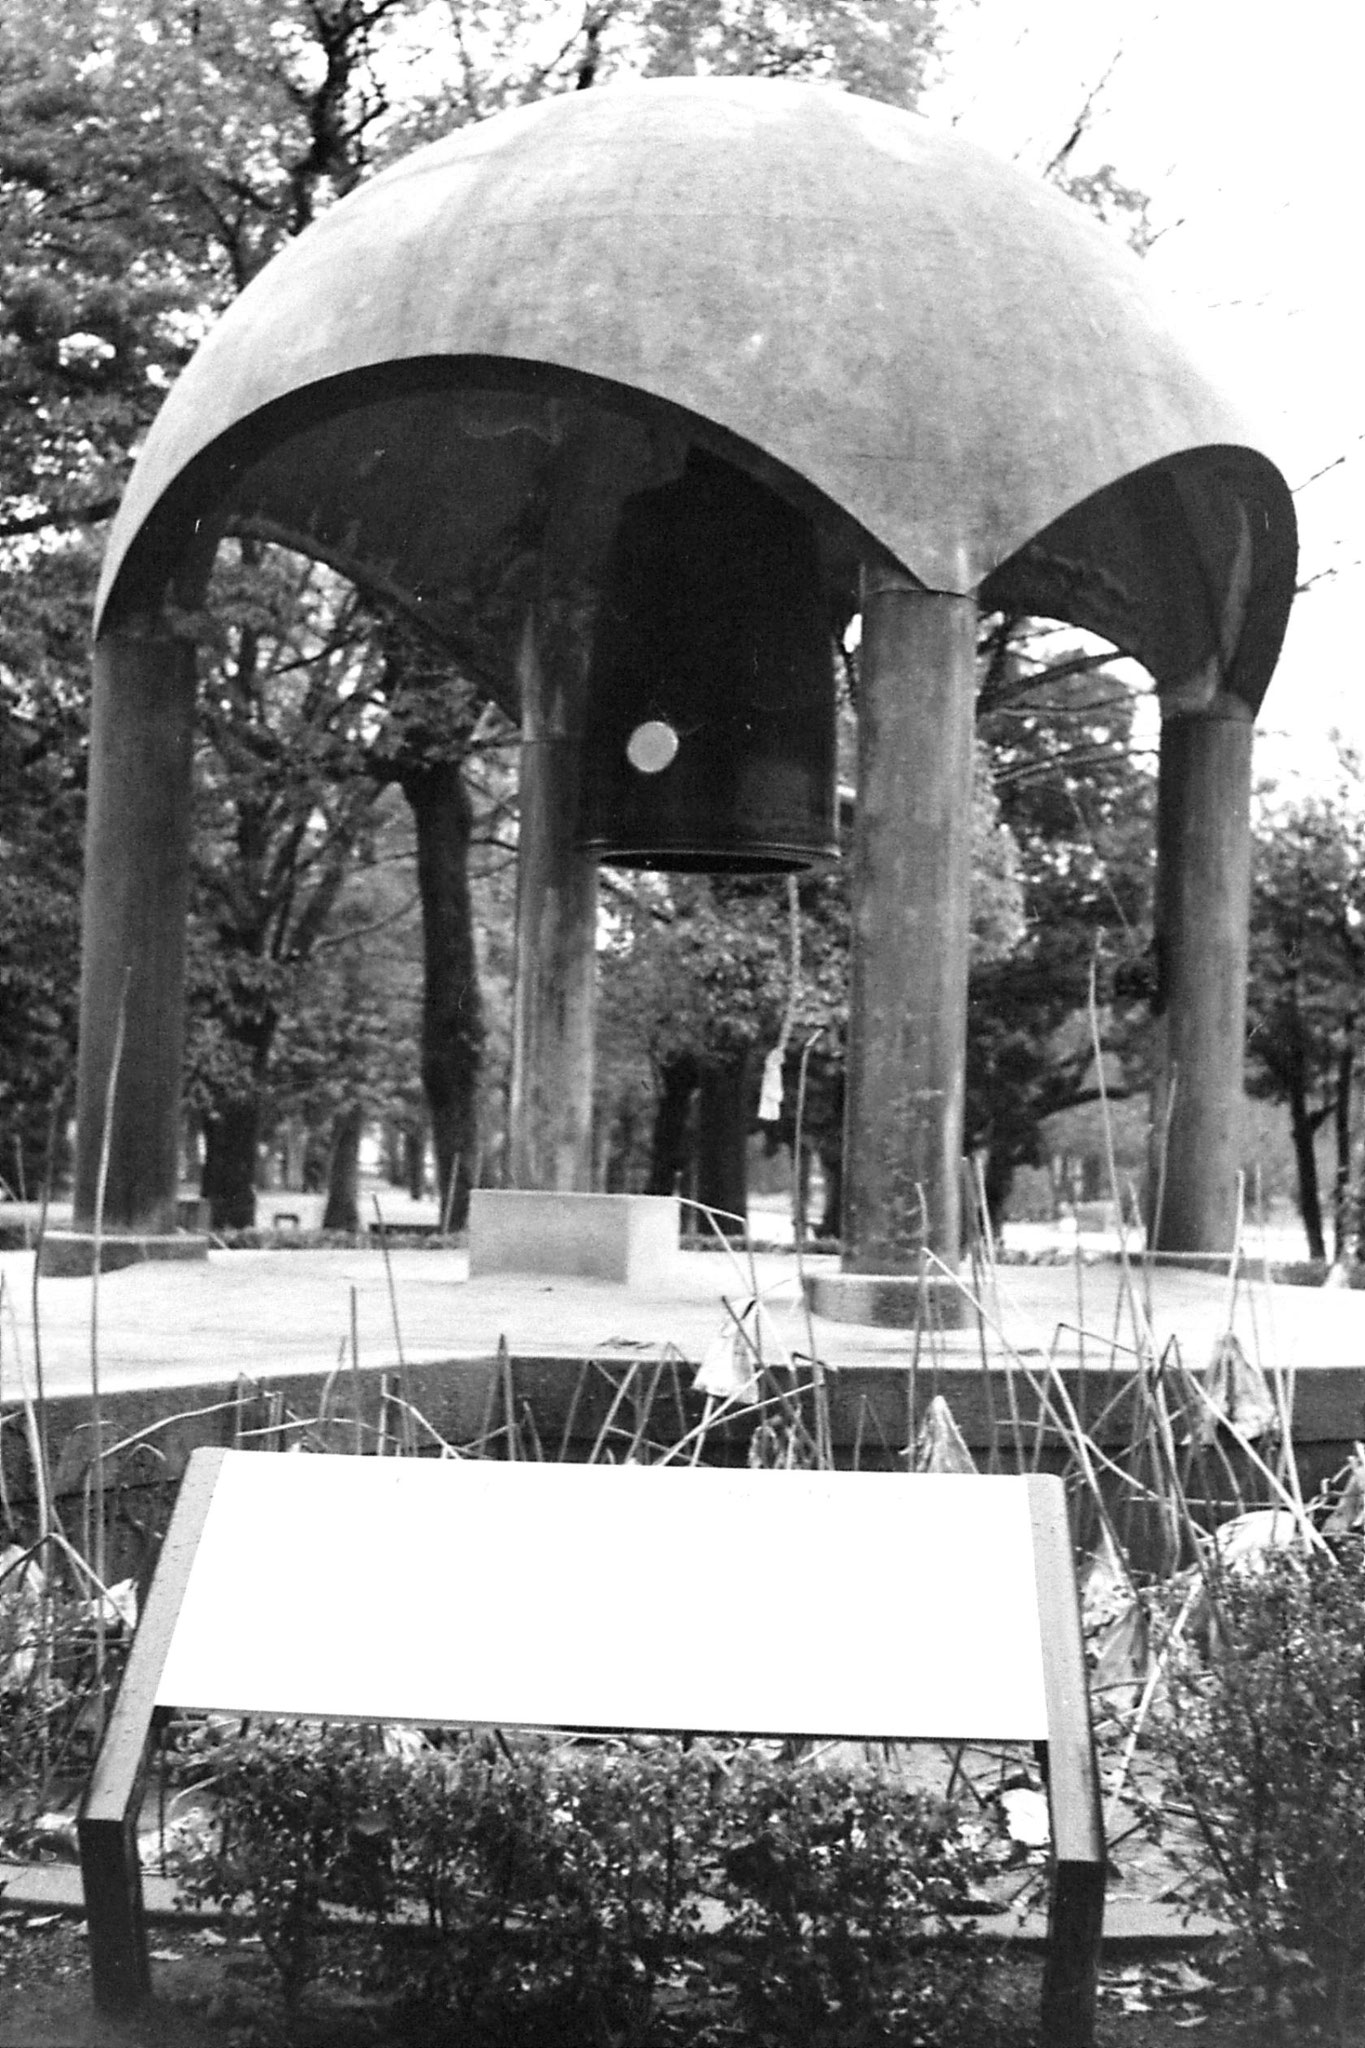 18/1/1989: 16: Hiroshima